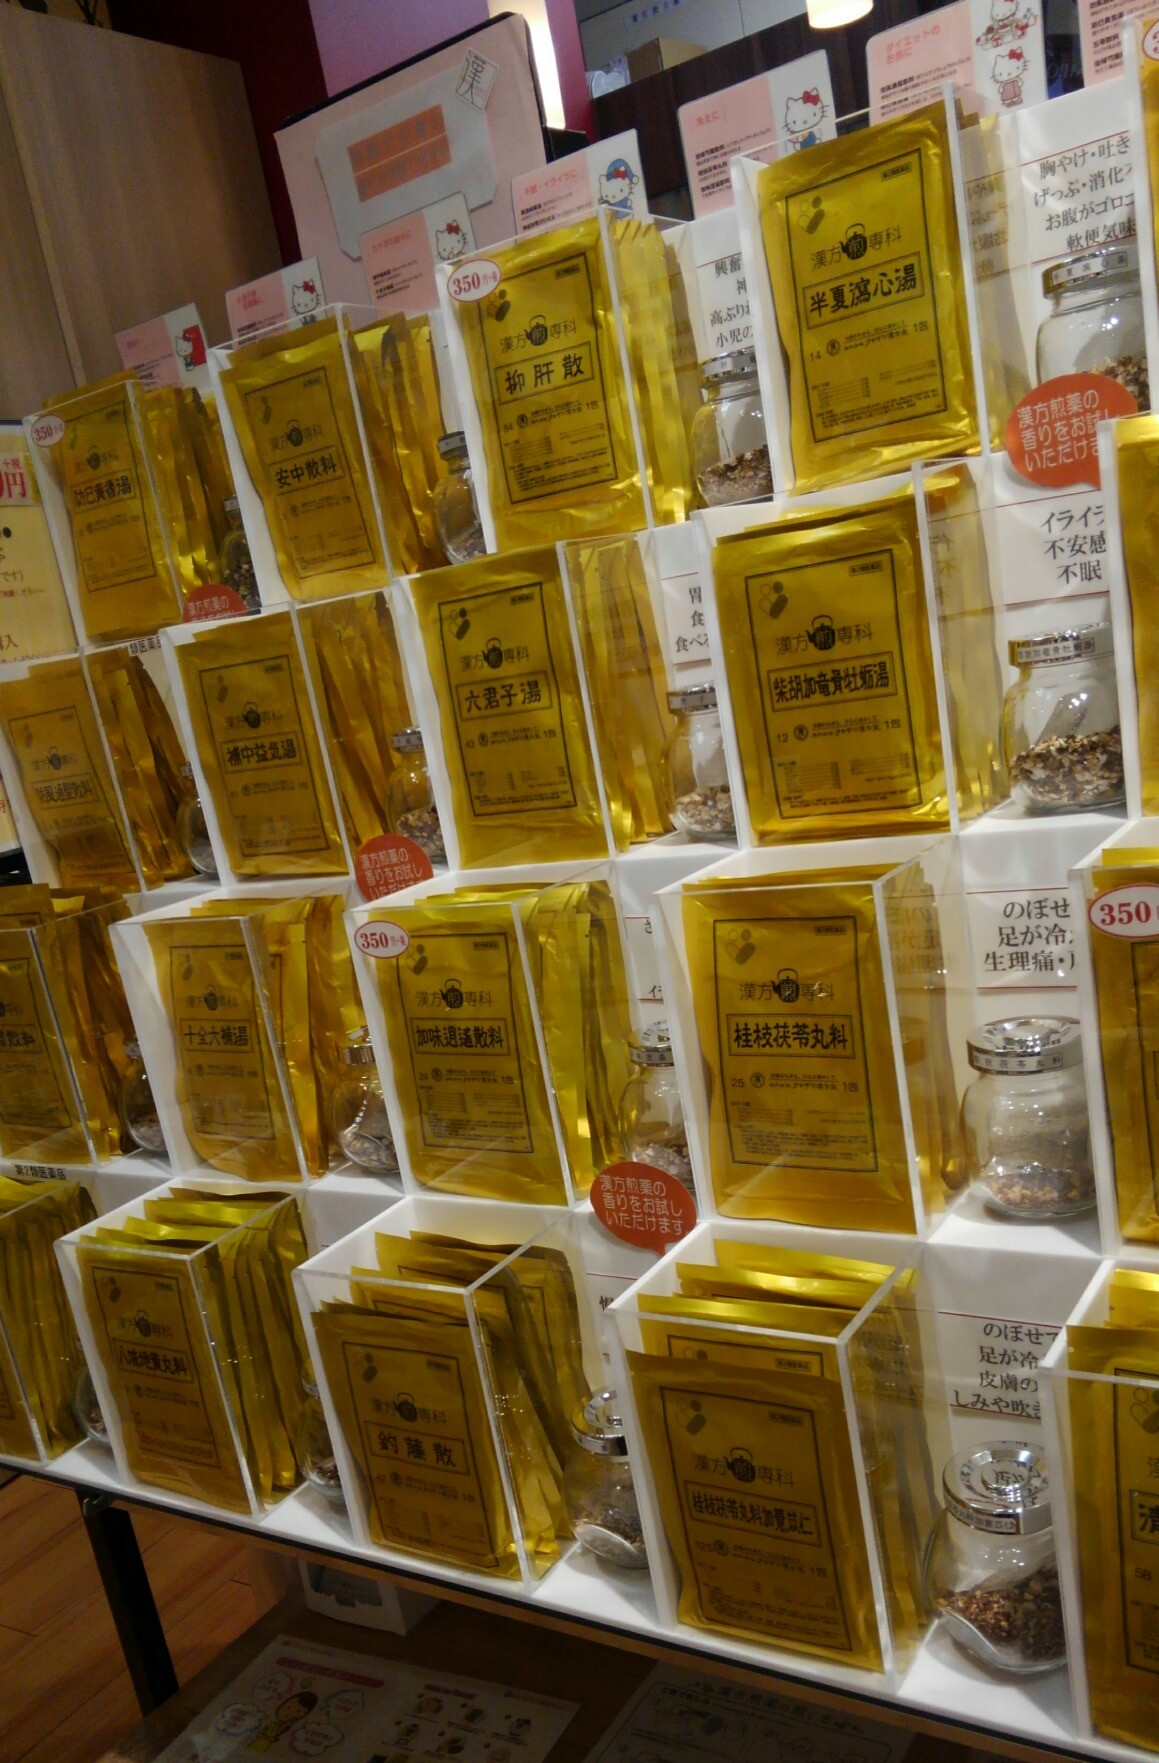 「KAMPO煎専堂」がイオンモール津田沼店にオープン。健康力・免疫力アップを目指す!